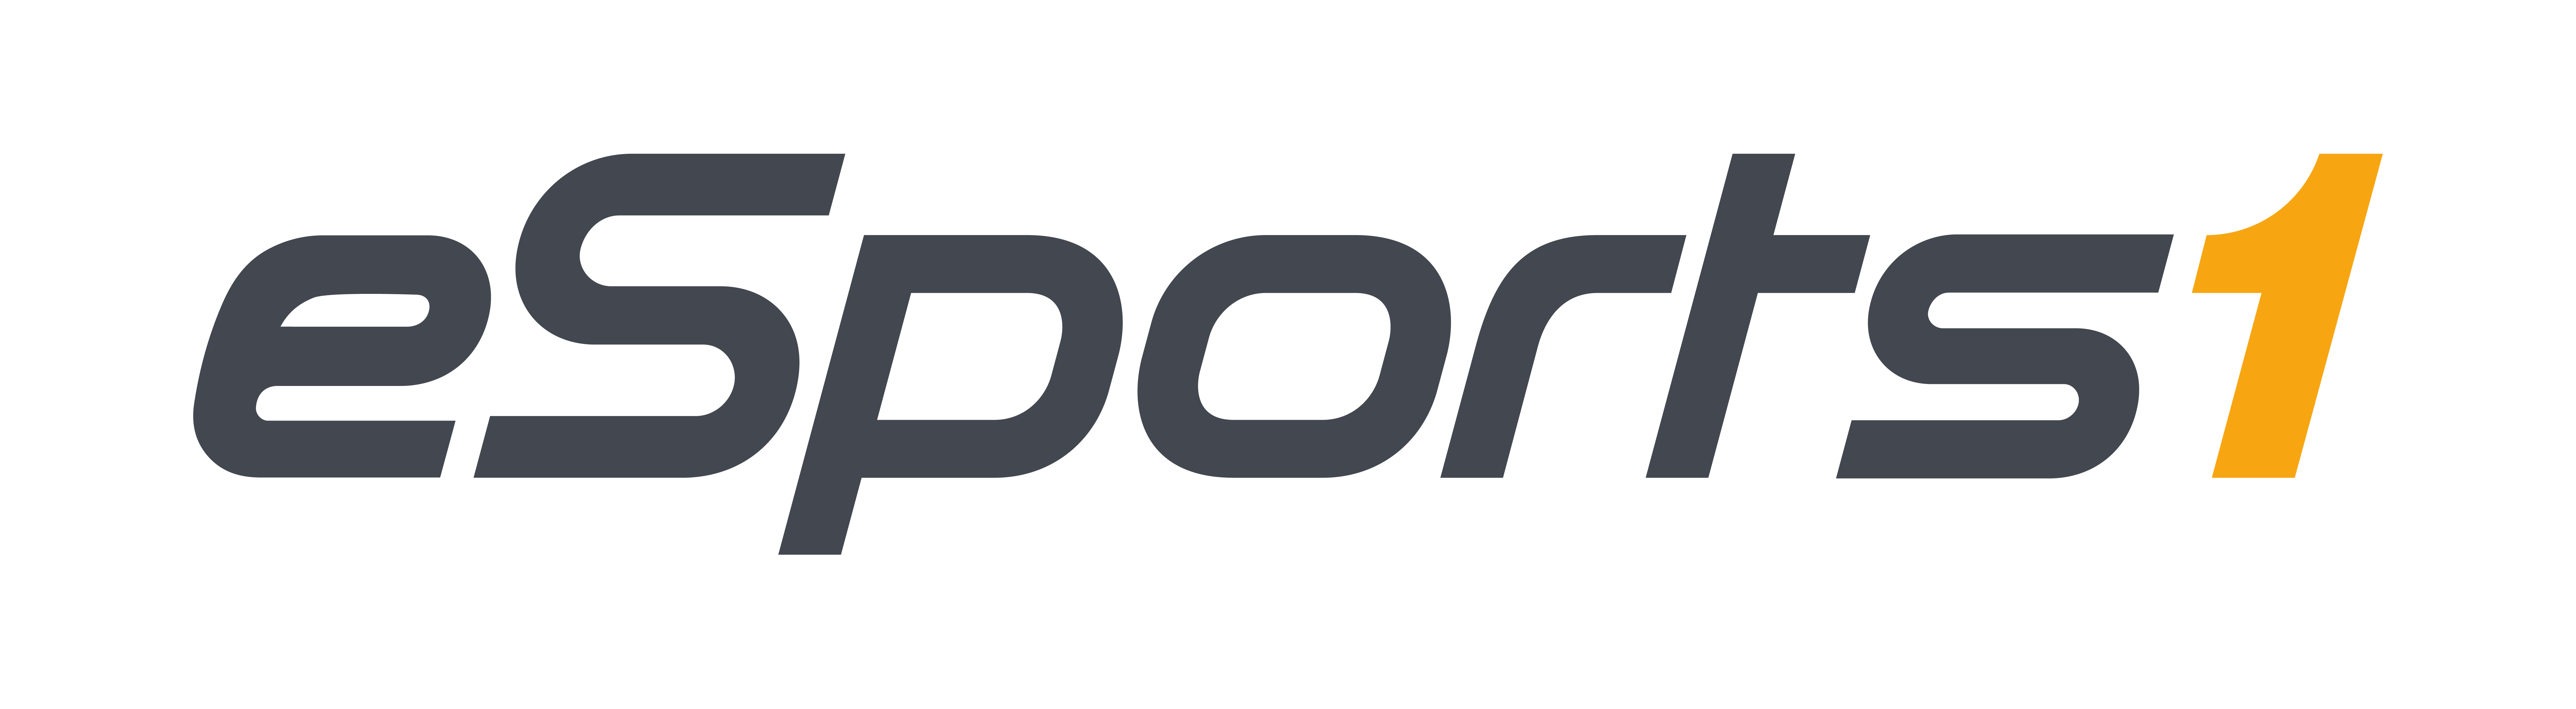 eSPORTS1 : la première chaîne germanophone d'eSports ESports_1_RGB_positiv.png?TensidTrafficShaper=1&f=eSports_1_RGB_positiv